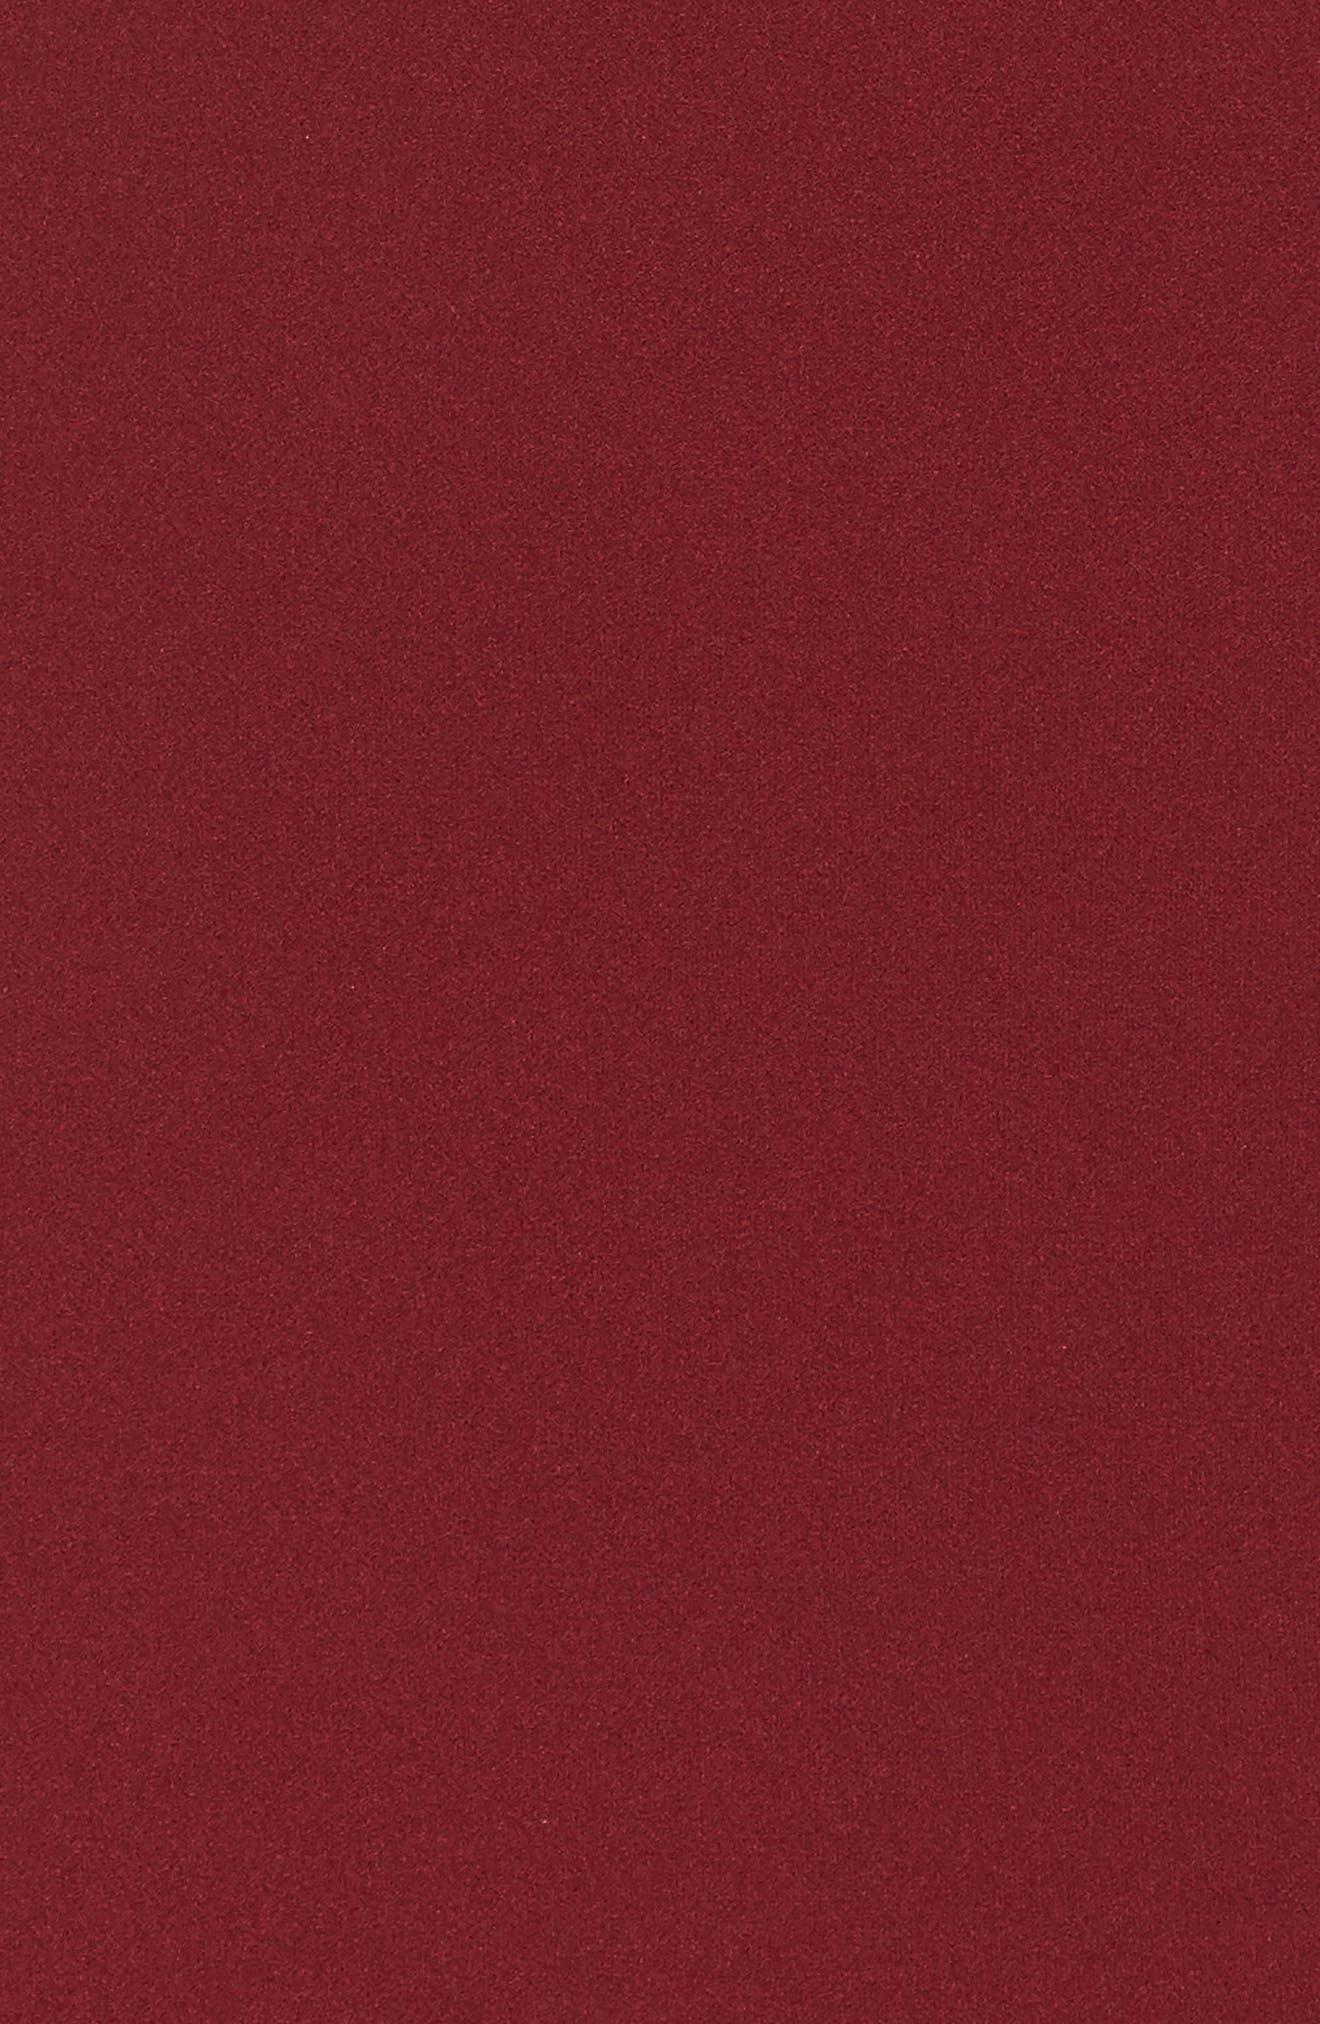 Ruffle Back Scuba Gown,                             Alternate thumbnail 5, color,                             Merlot